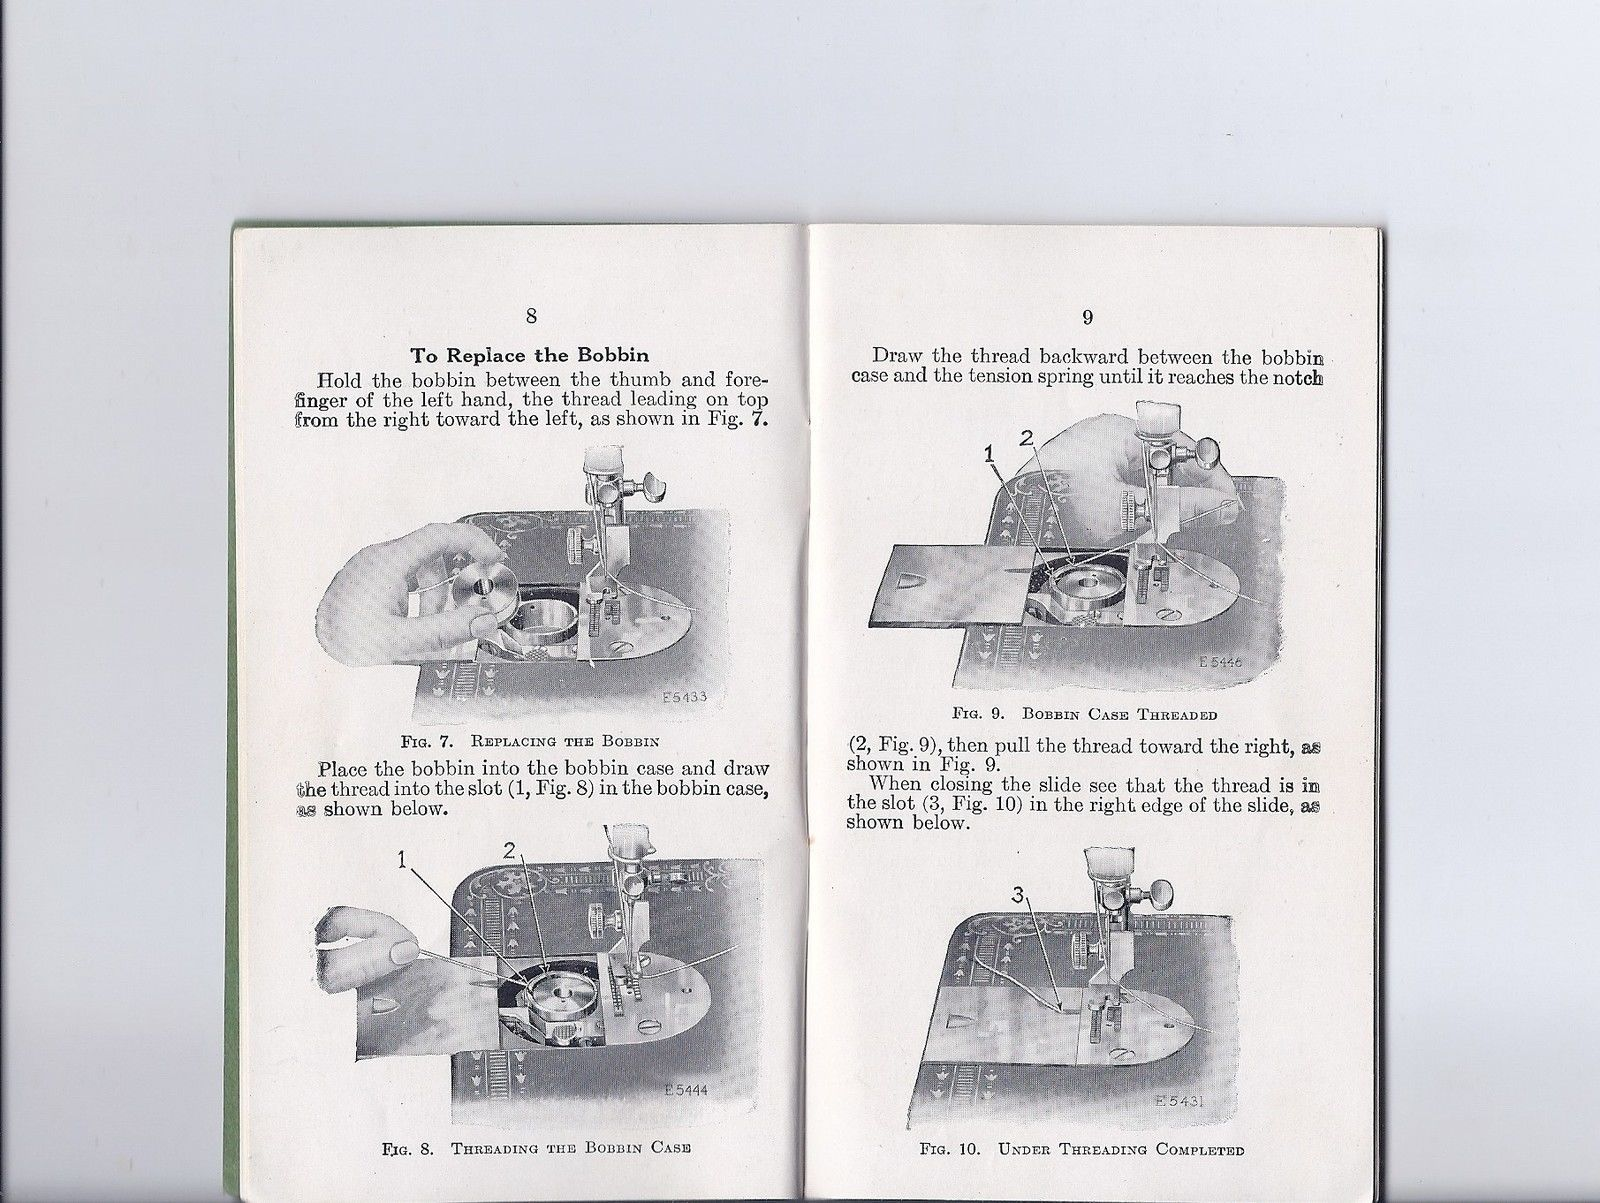 Antique 1924 Singer Model 66 Redeye Treadle Sewing Machine Wiring Diagram Instruction Manual Ebay